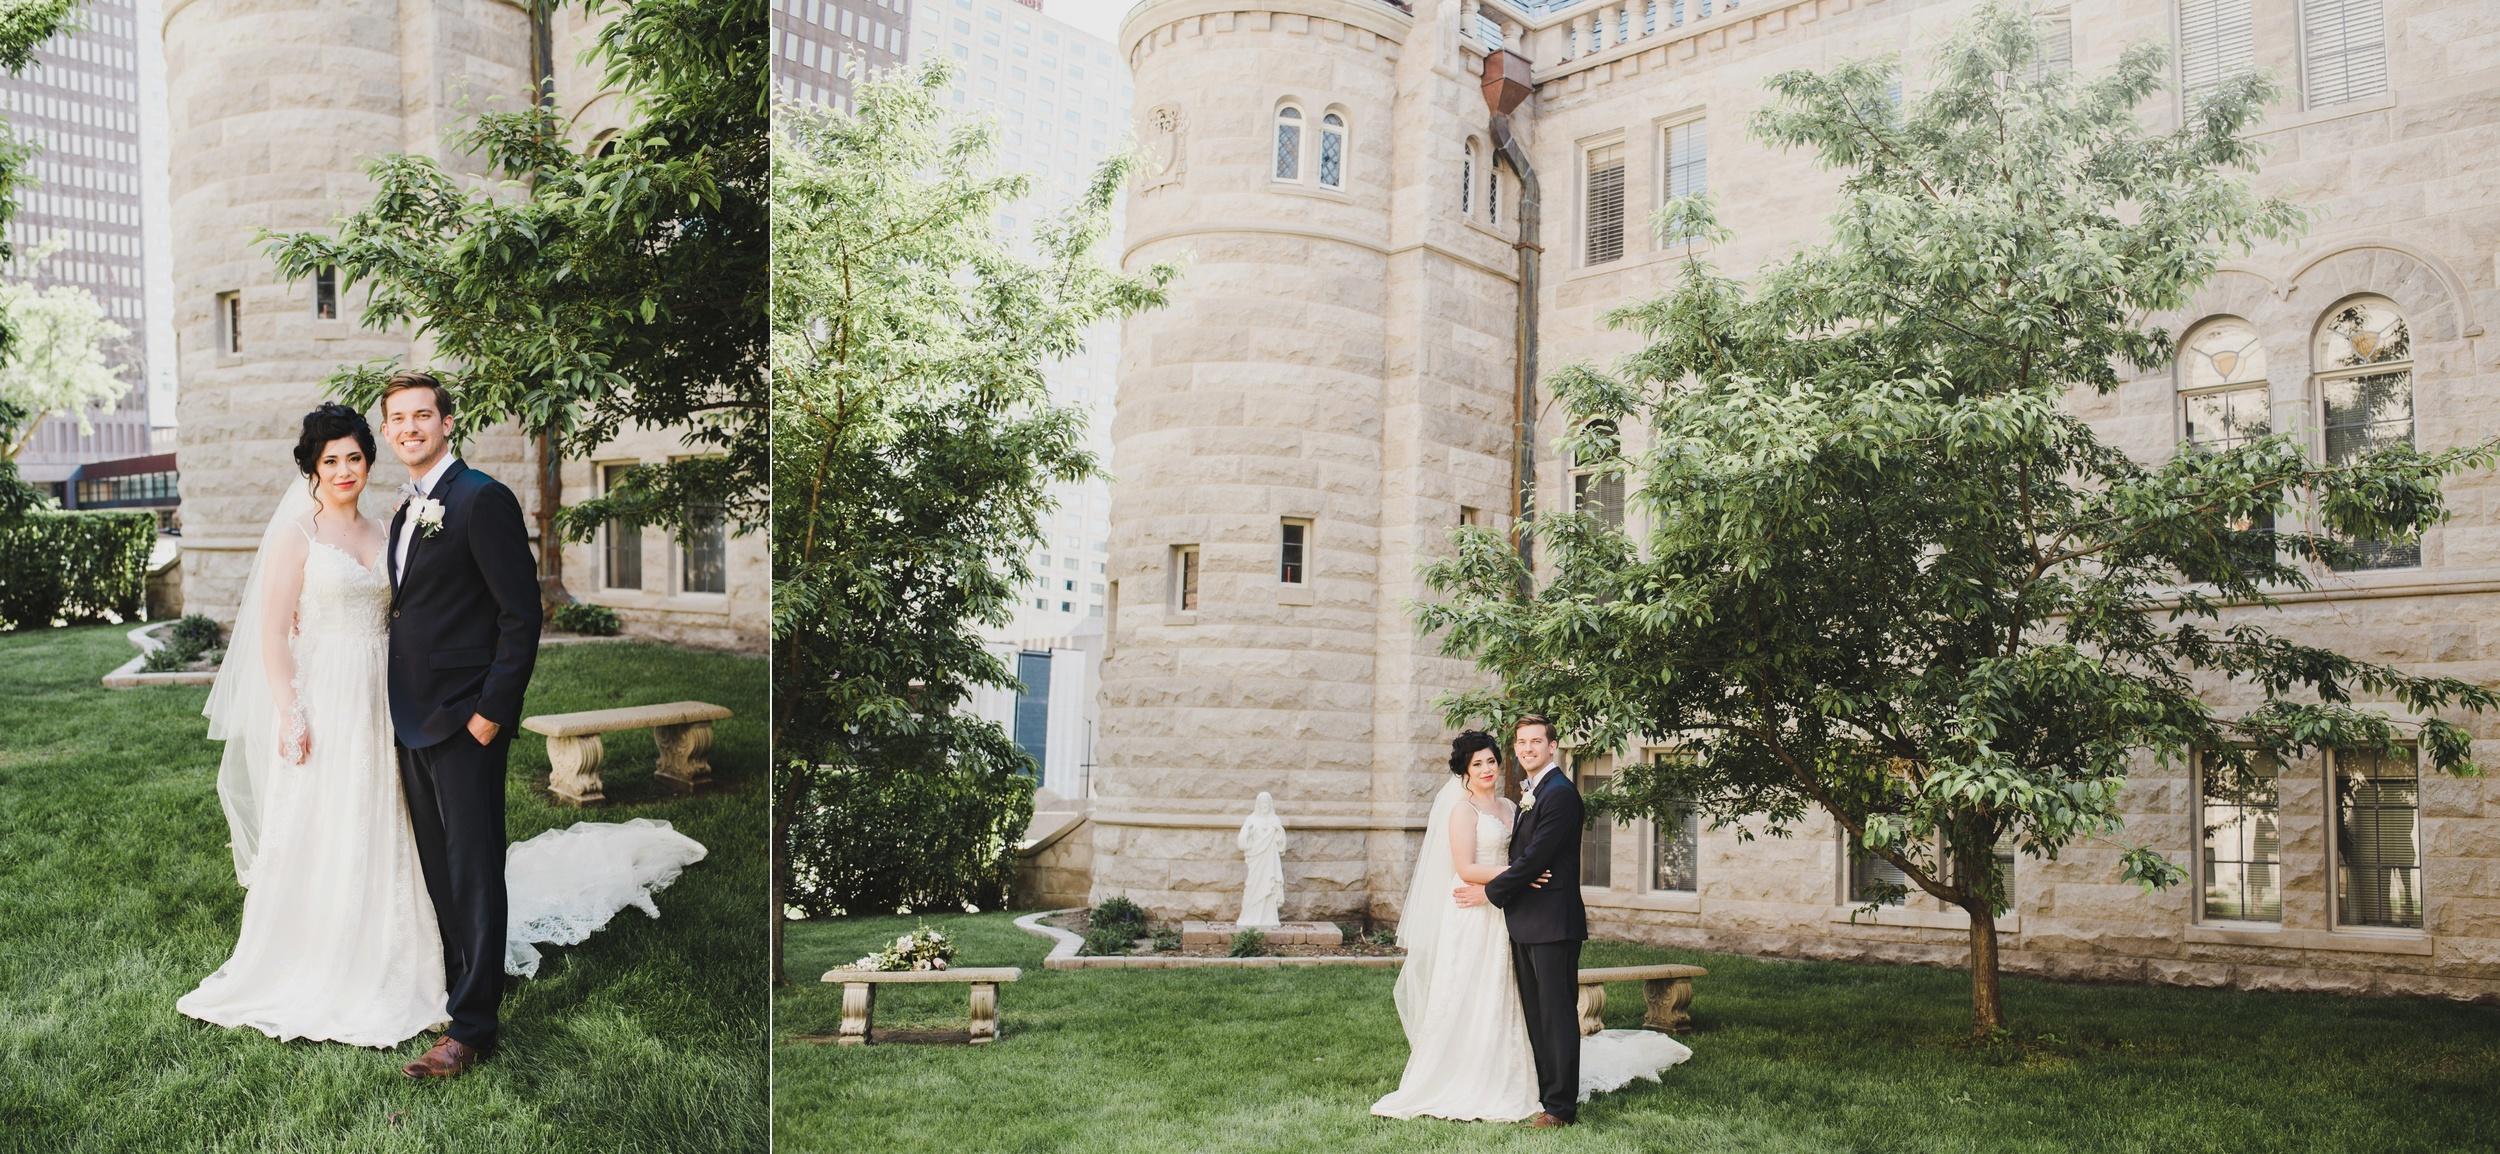 West End Architectural Salvage Wedding Photographer_2564.jpg